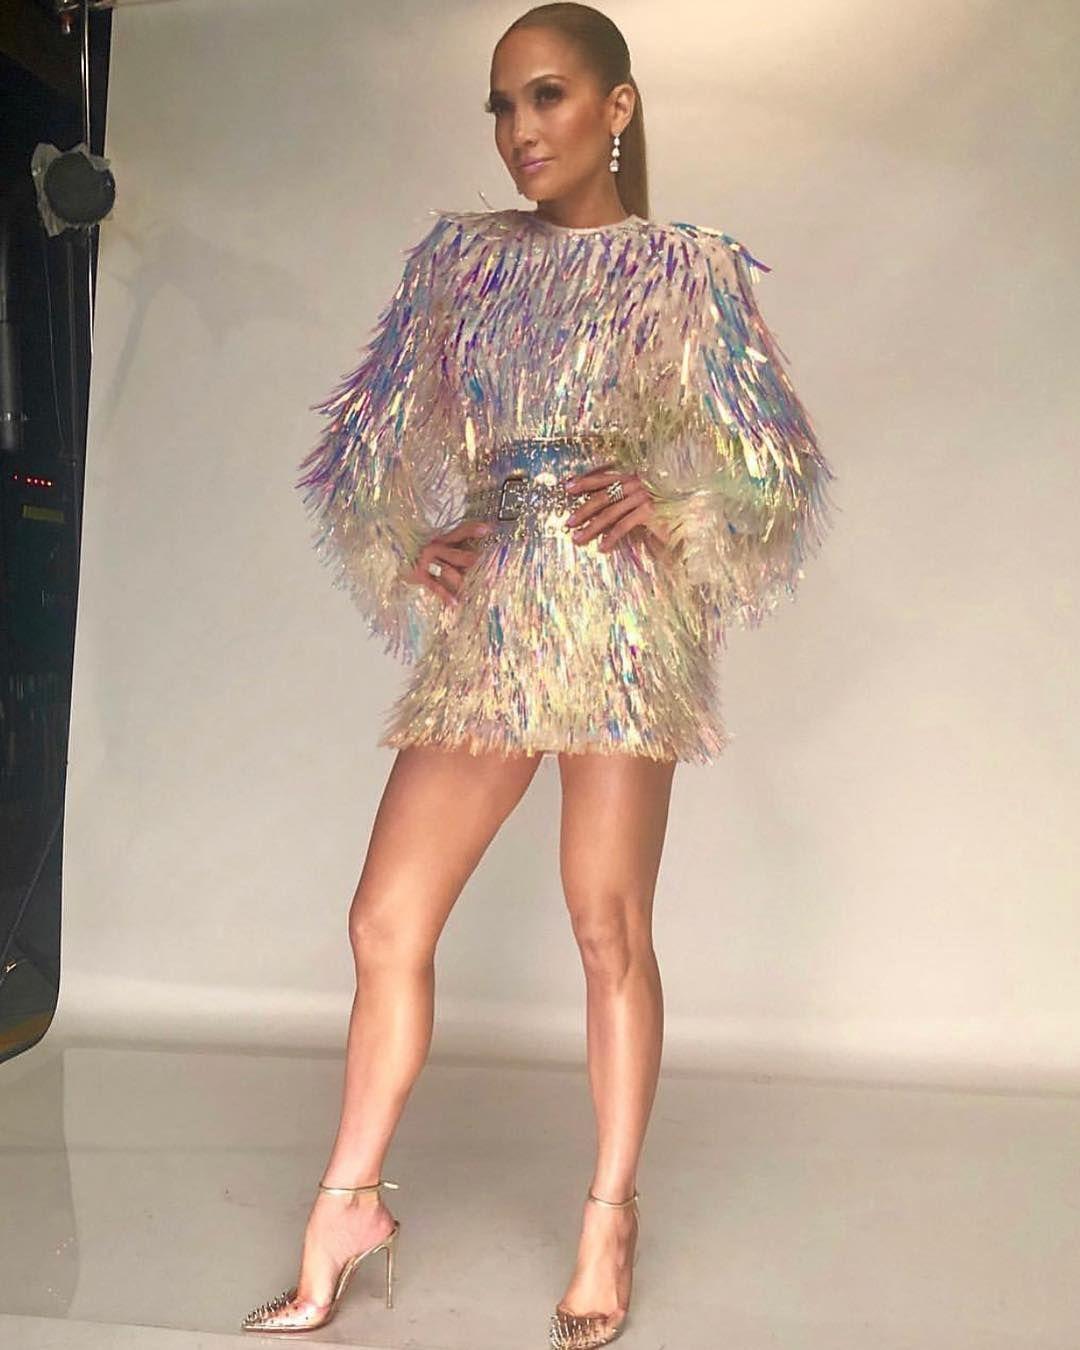 da577988ee0 Jennifer Lopez wore a Balmain mini dress while shooting ads for NBC's World  of Dance.